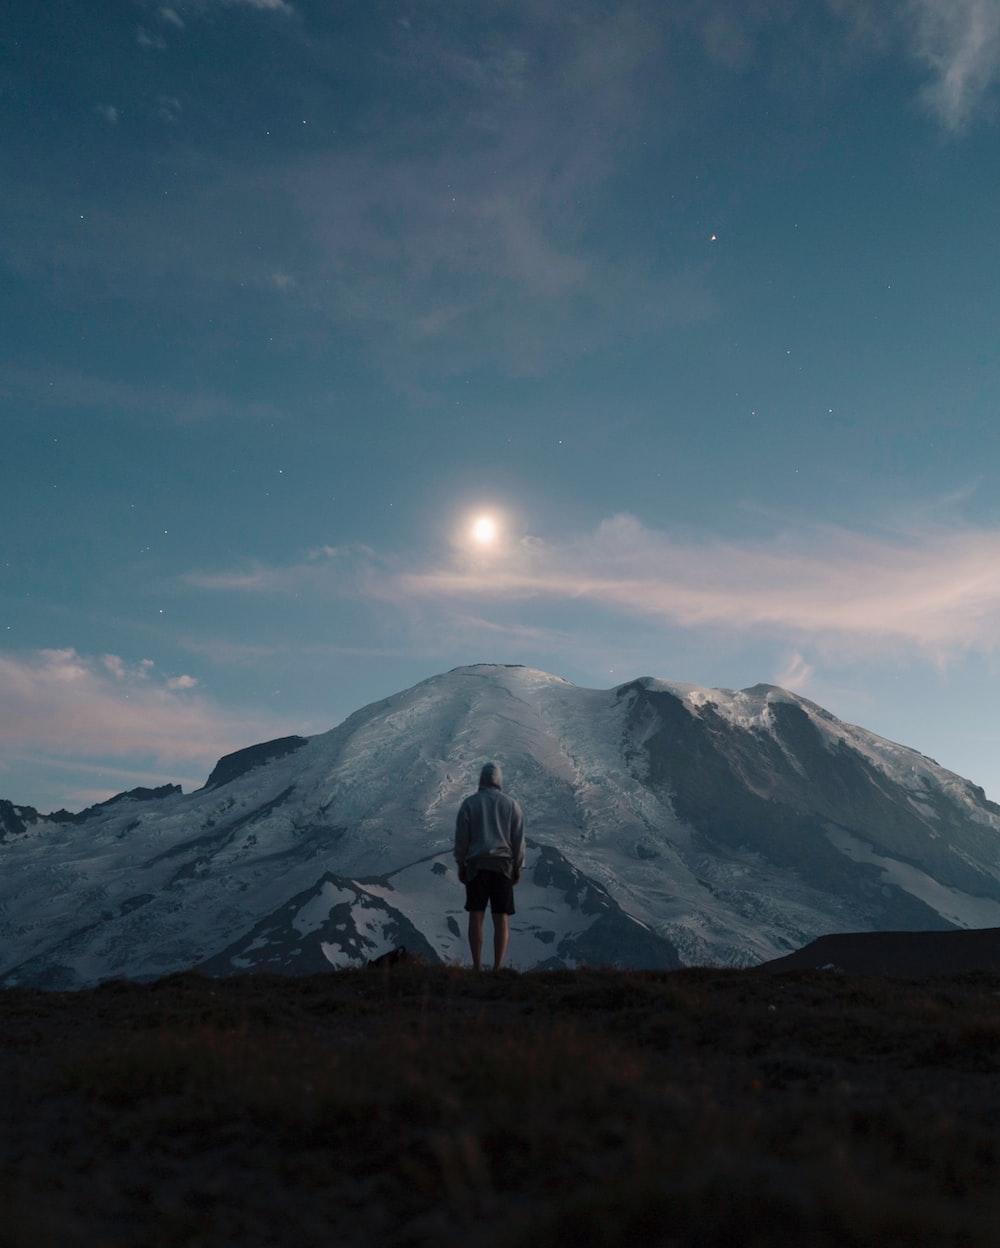 man standing on grass field overlooking mountain